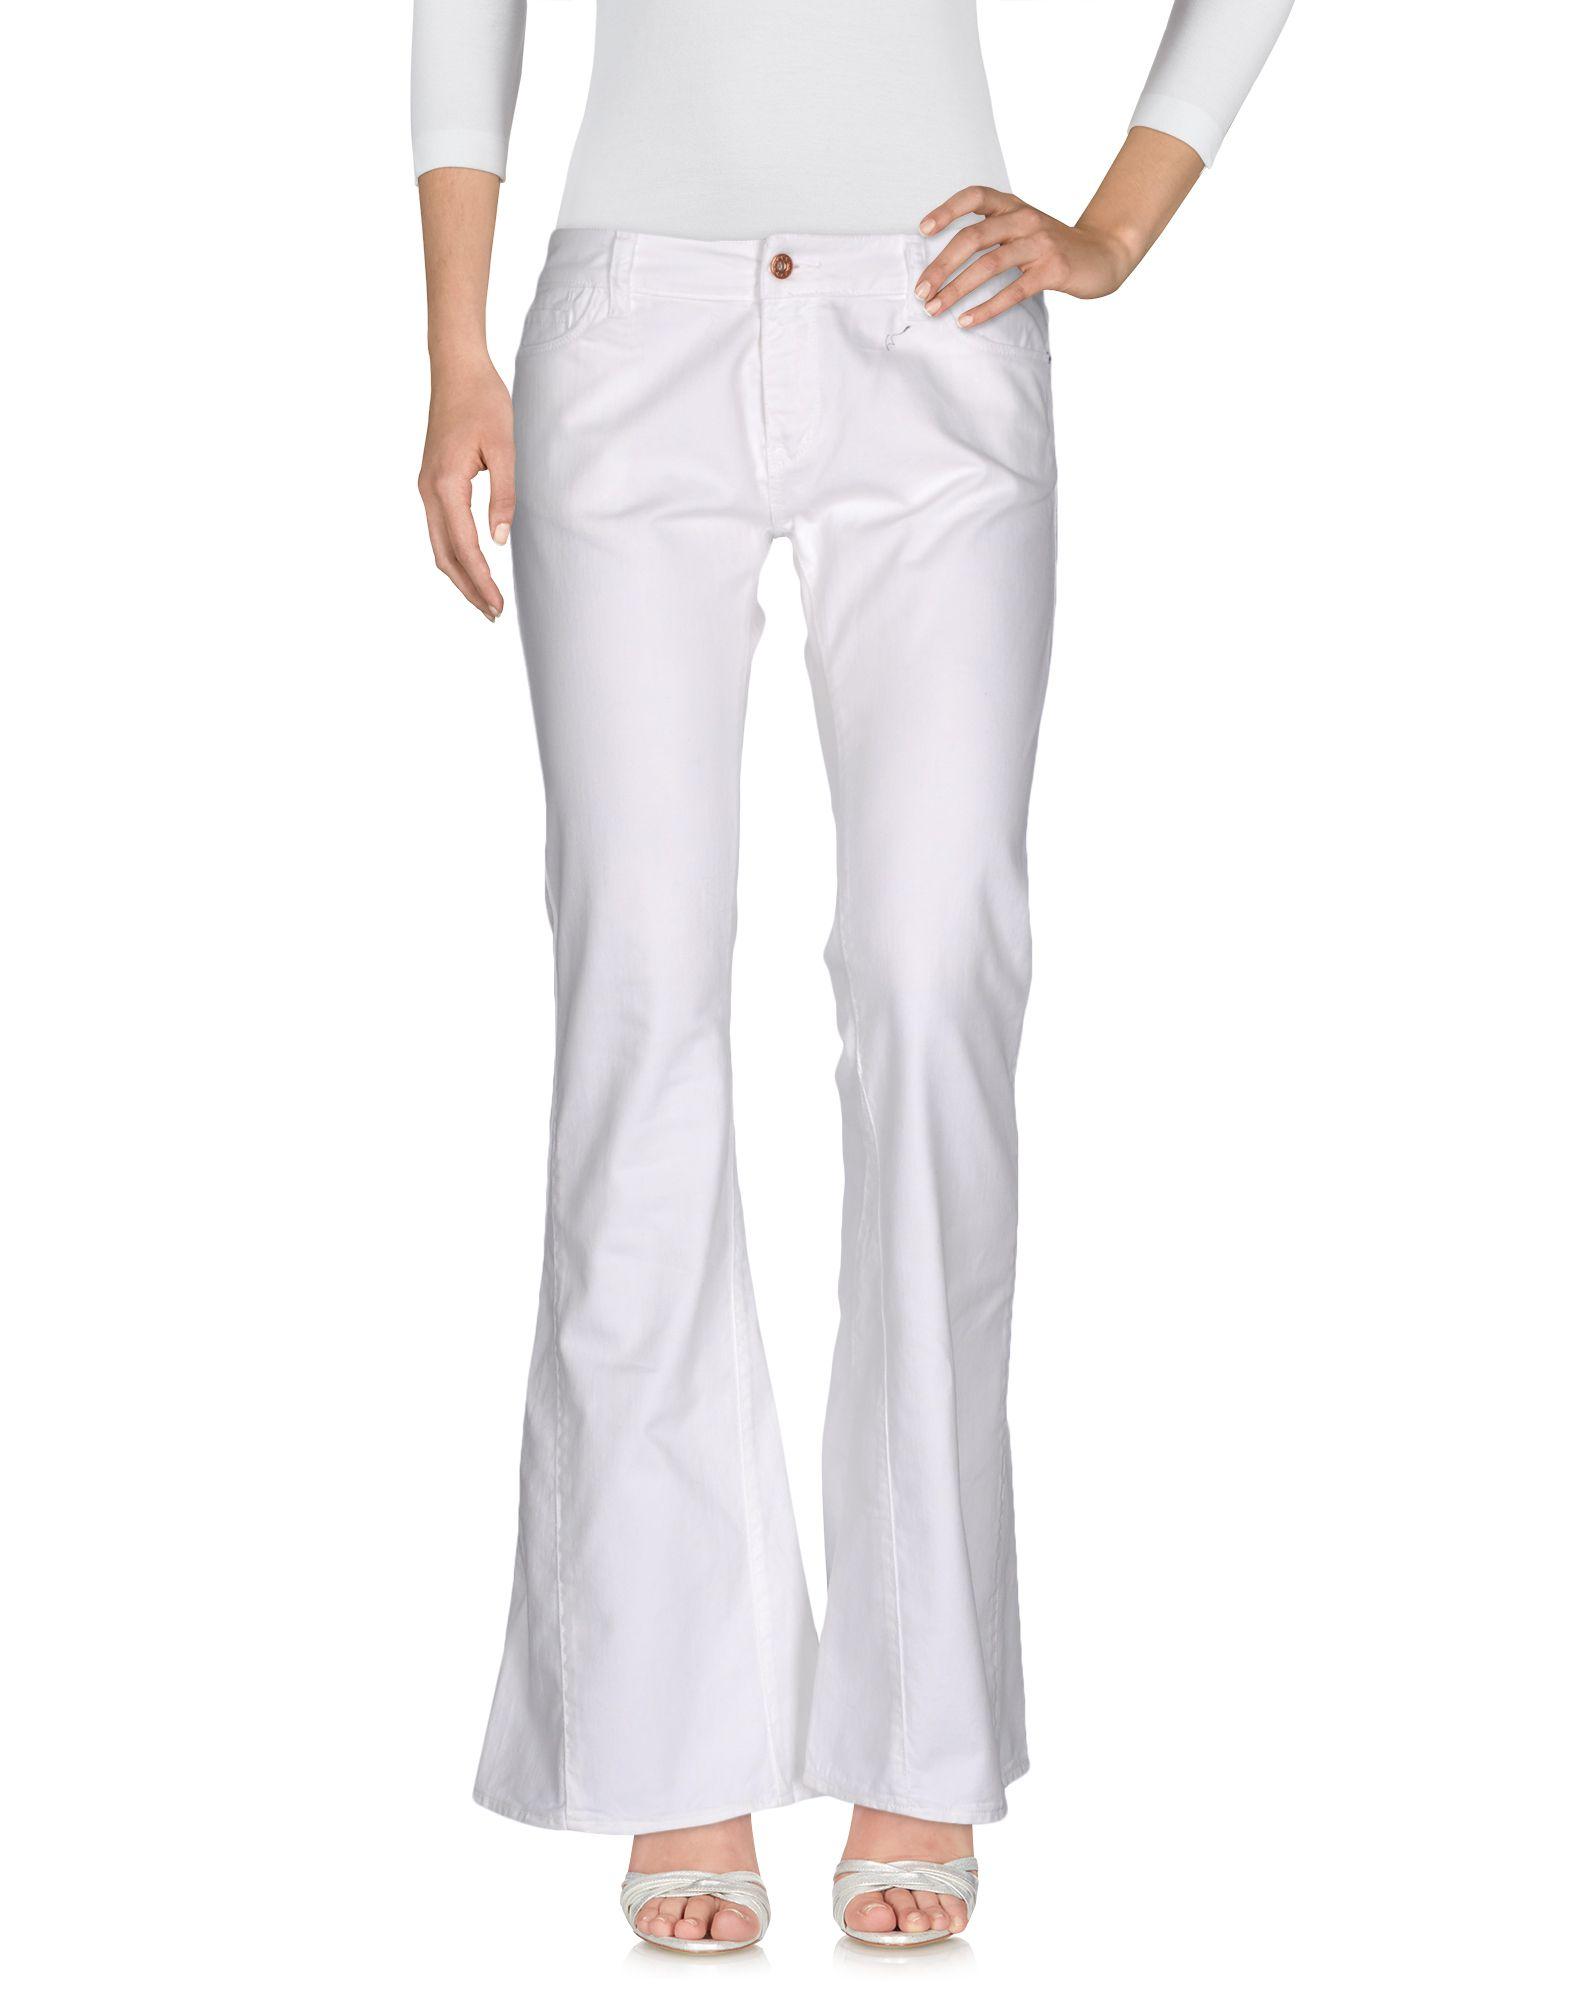 M&M TAILOR Джинсовые брюки akg pae5 m